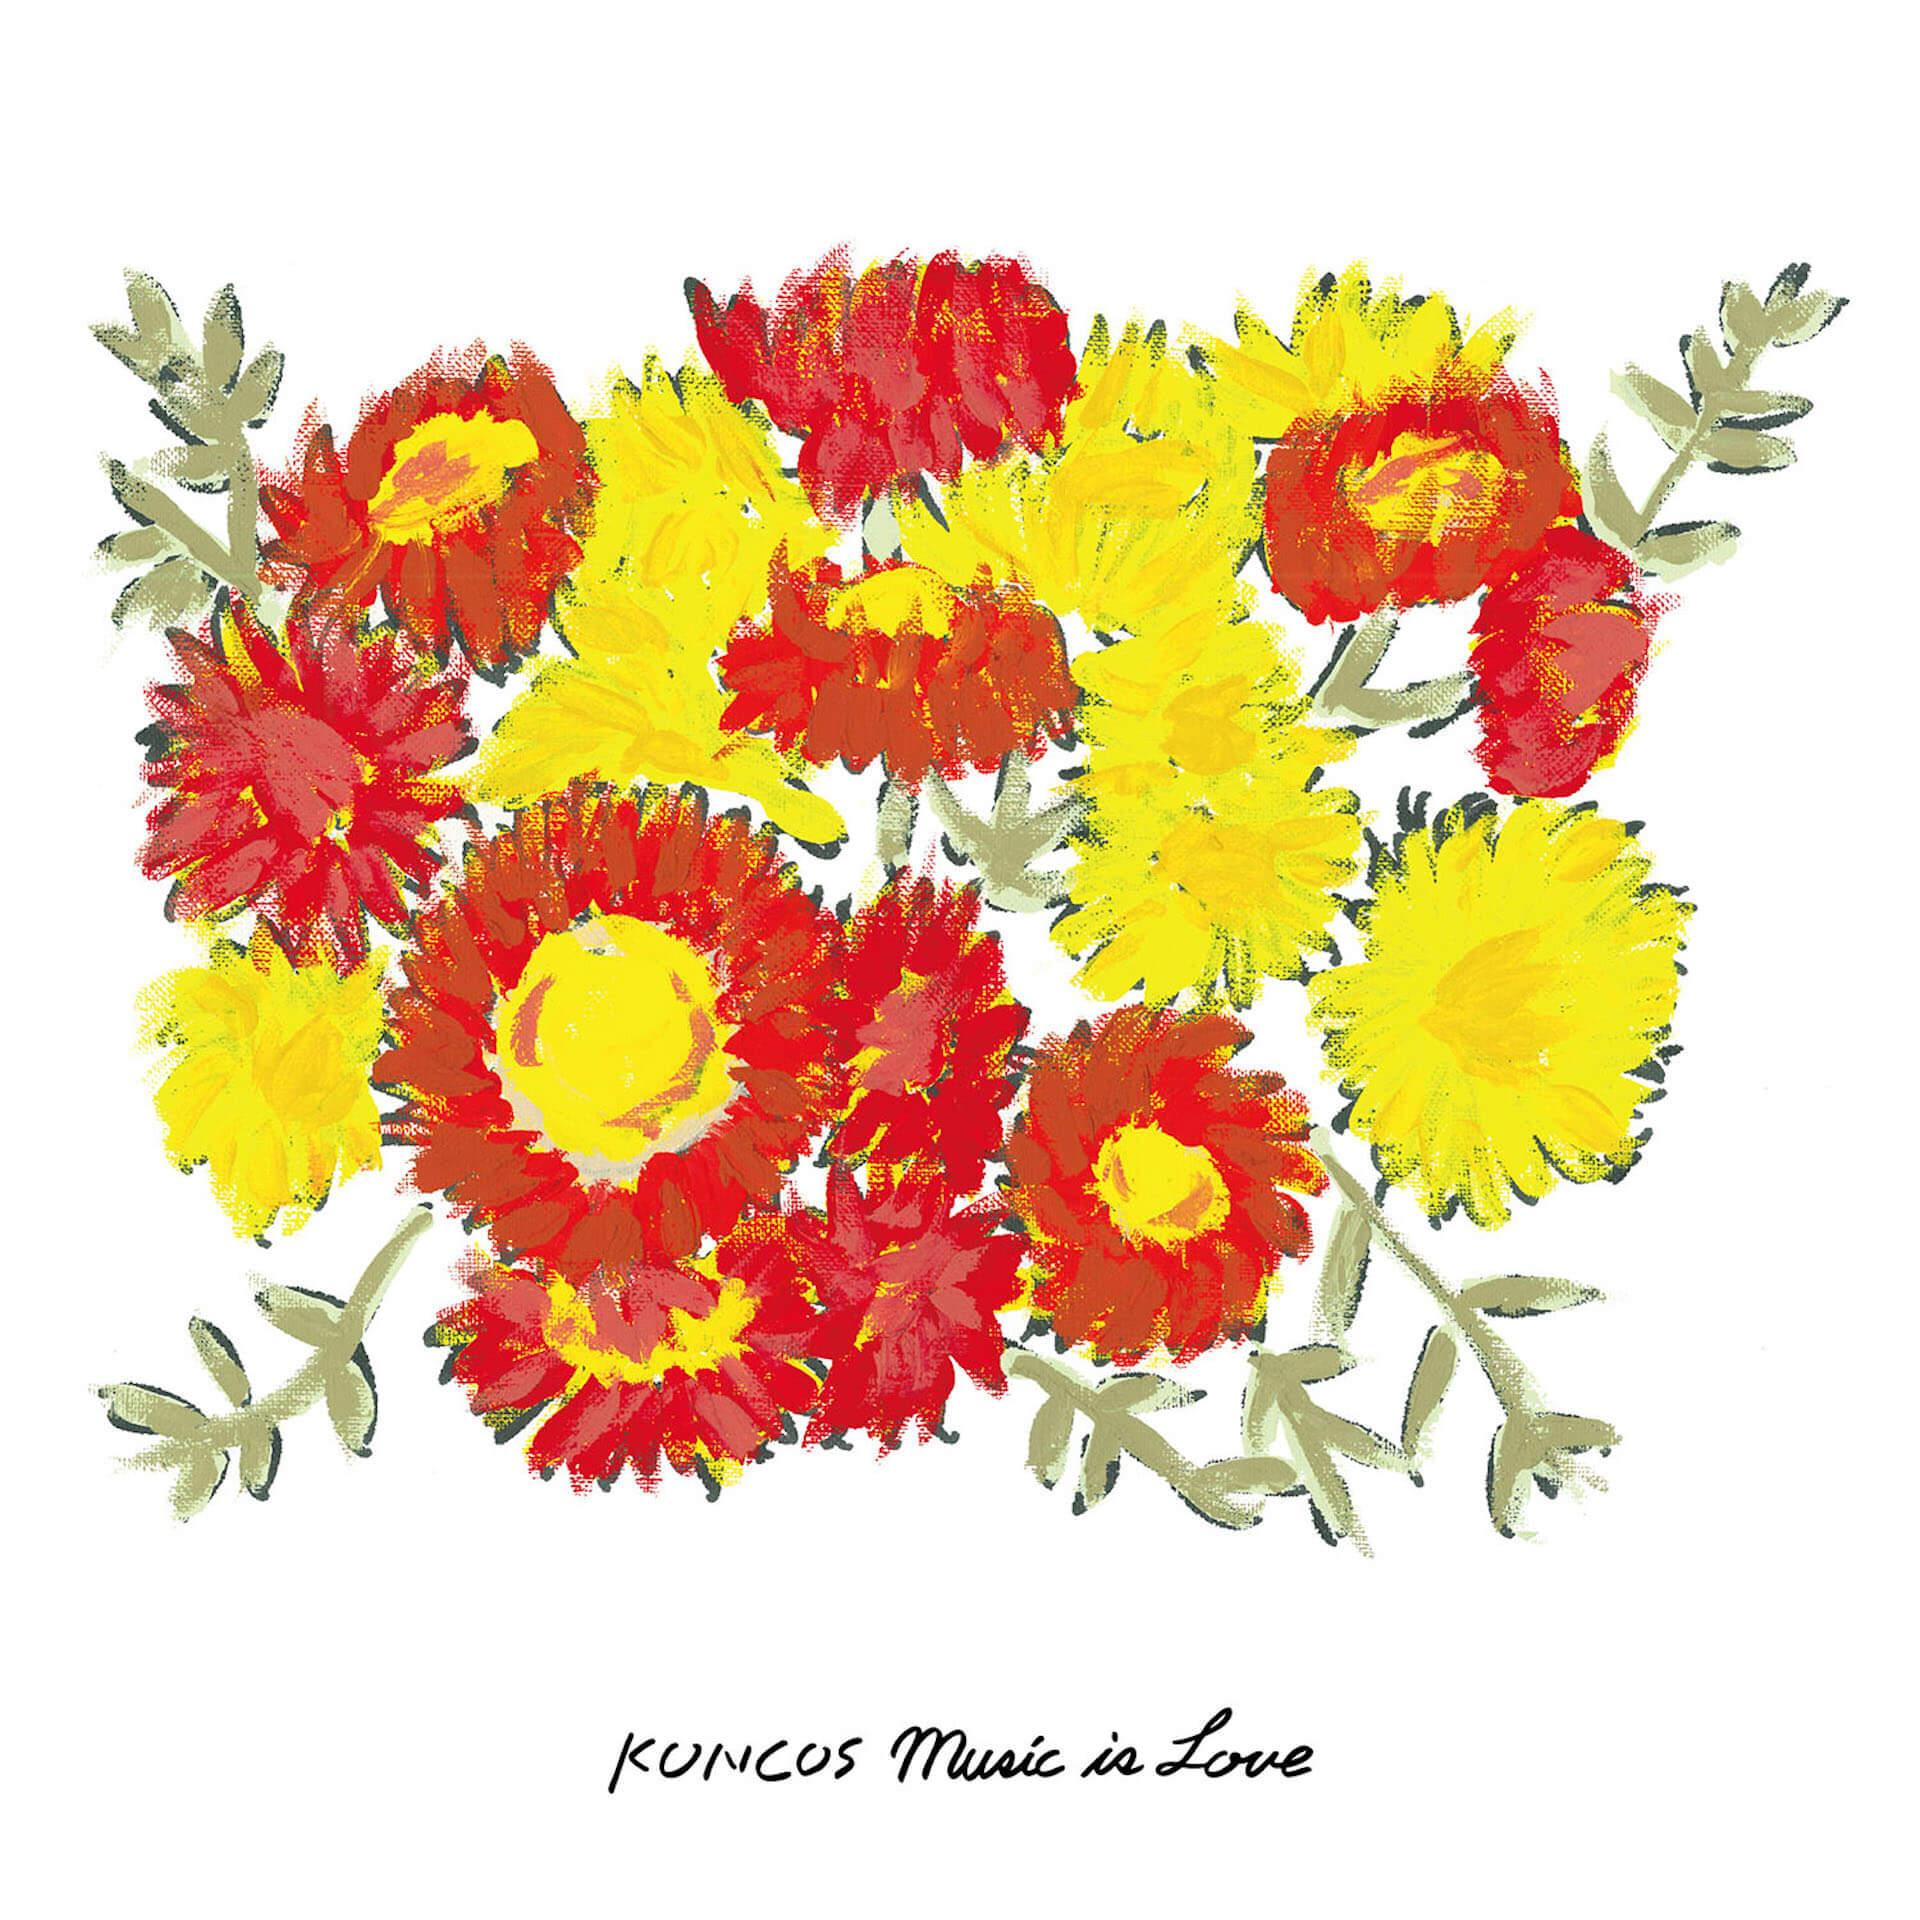 『Music Is Love』をリリースしたKONCOSのポップアップショップが新代田POOTLEで開催! life210421_koncos_anoraks_4